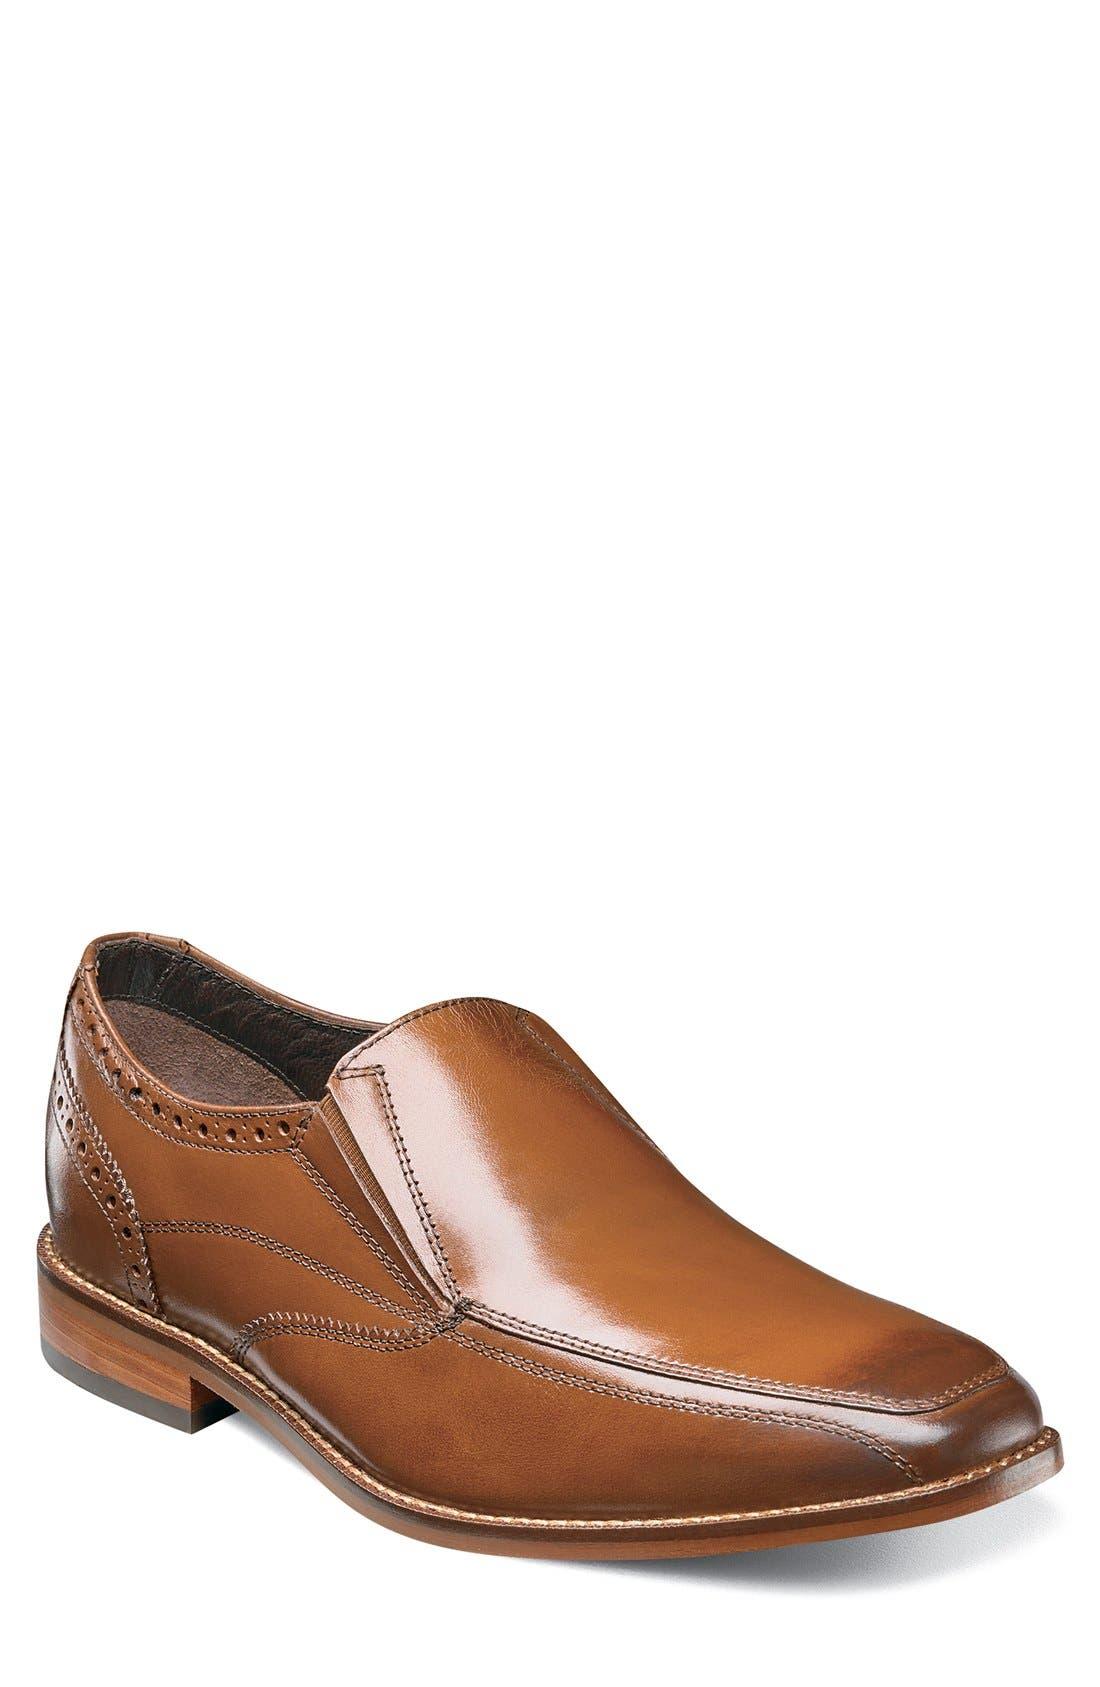 'Castellano' Venetian Loafer,                         Main,                         color, 237